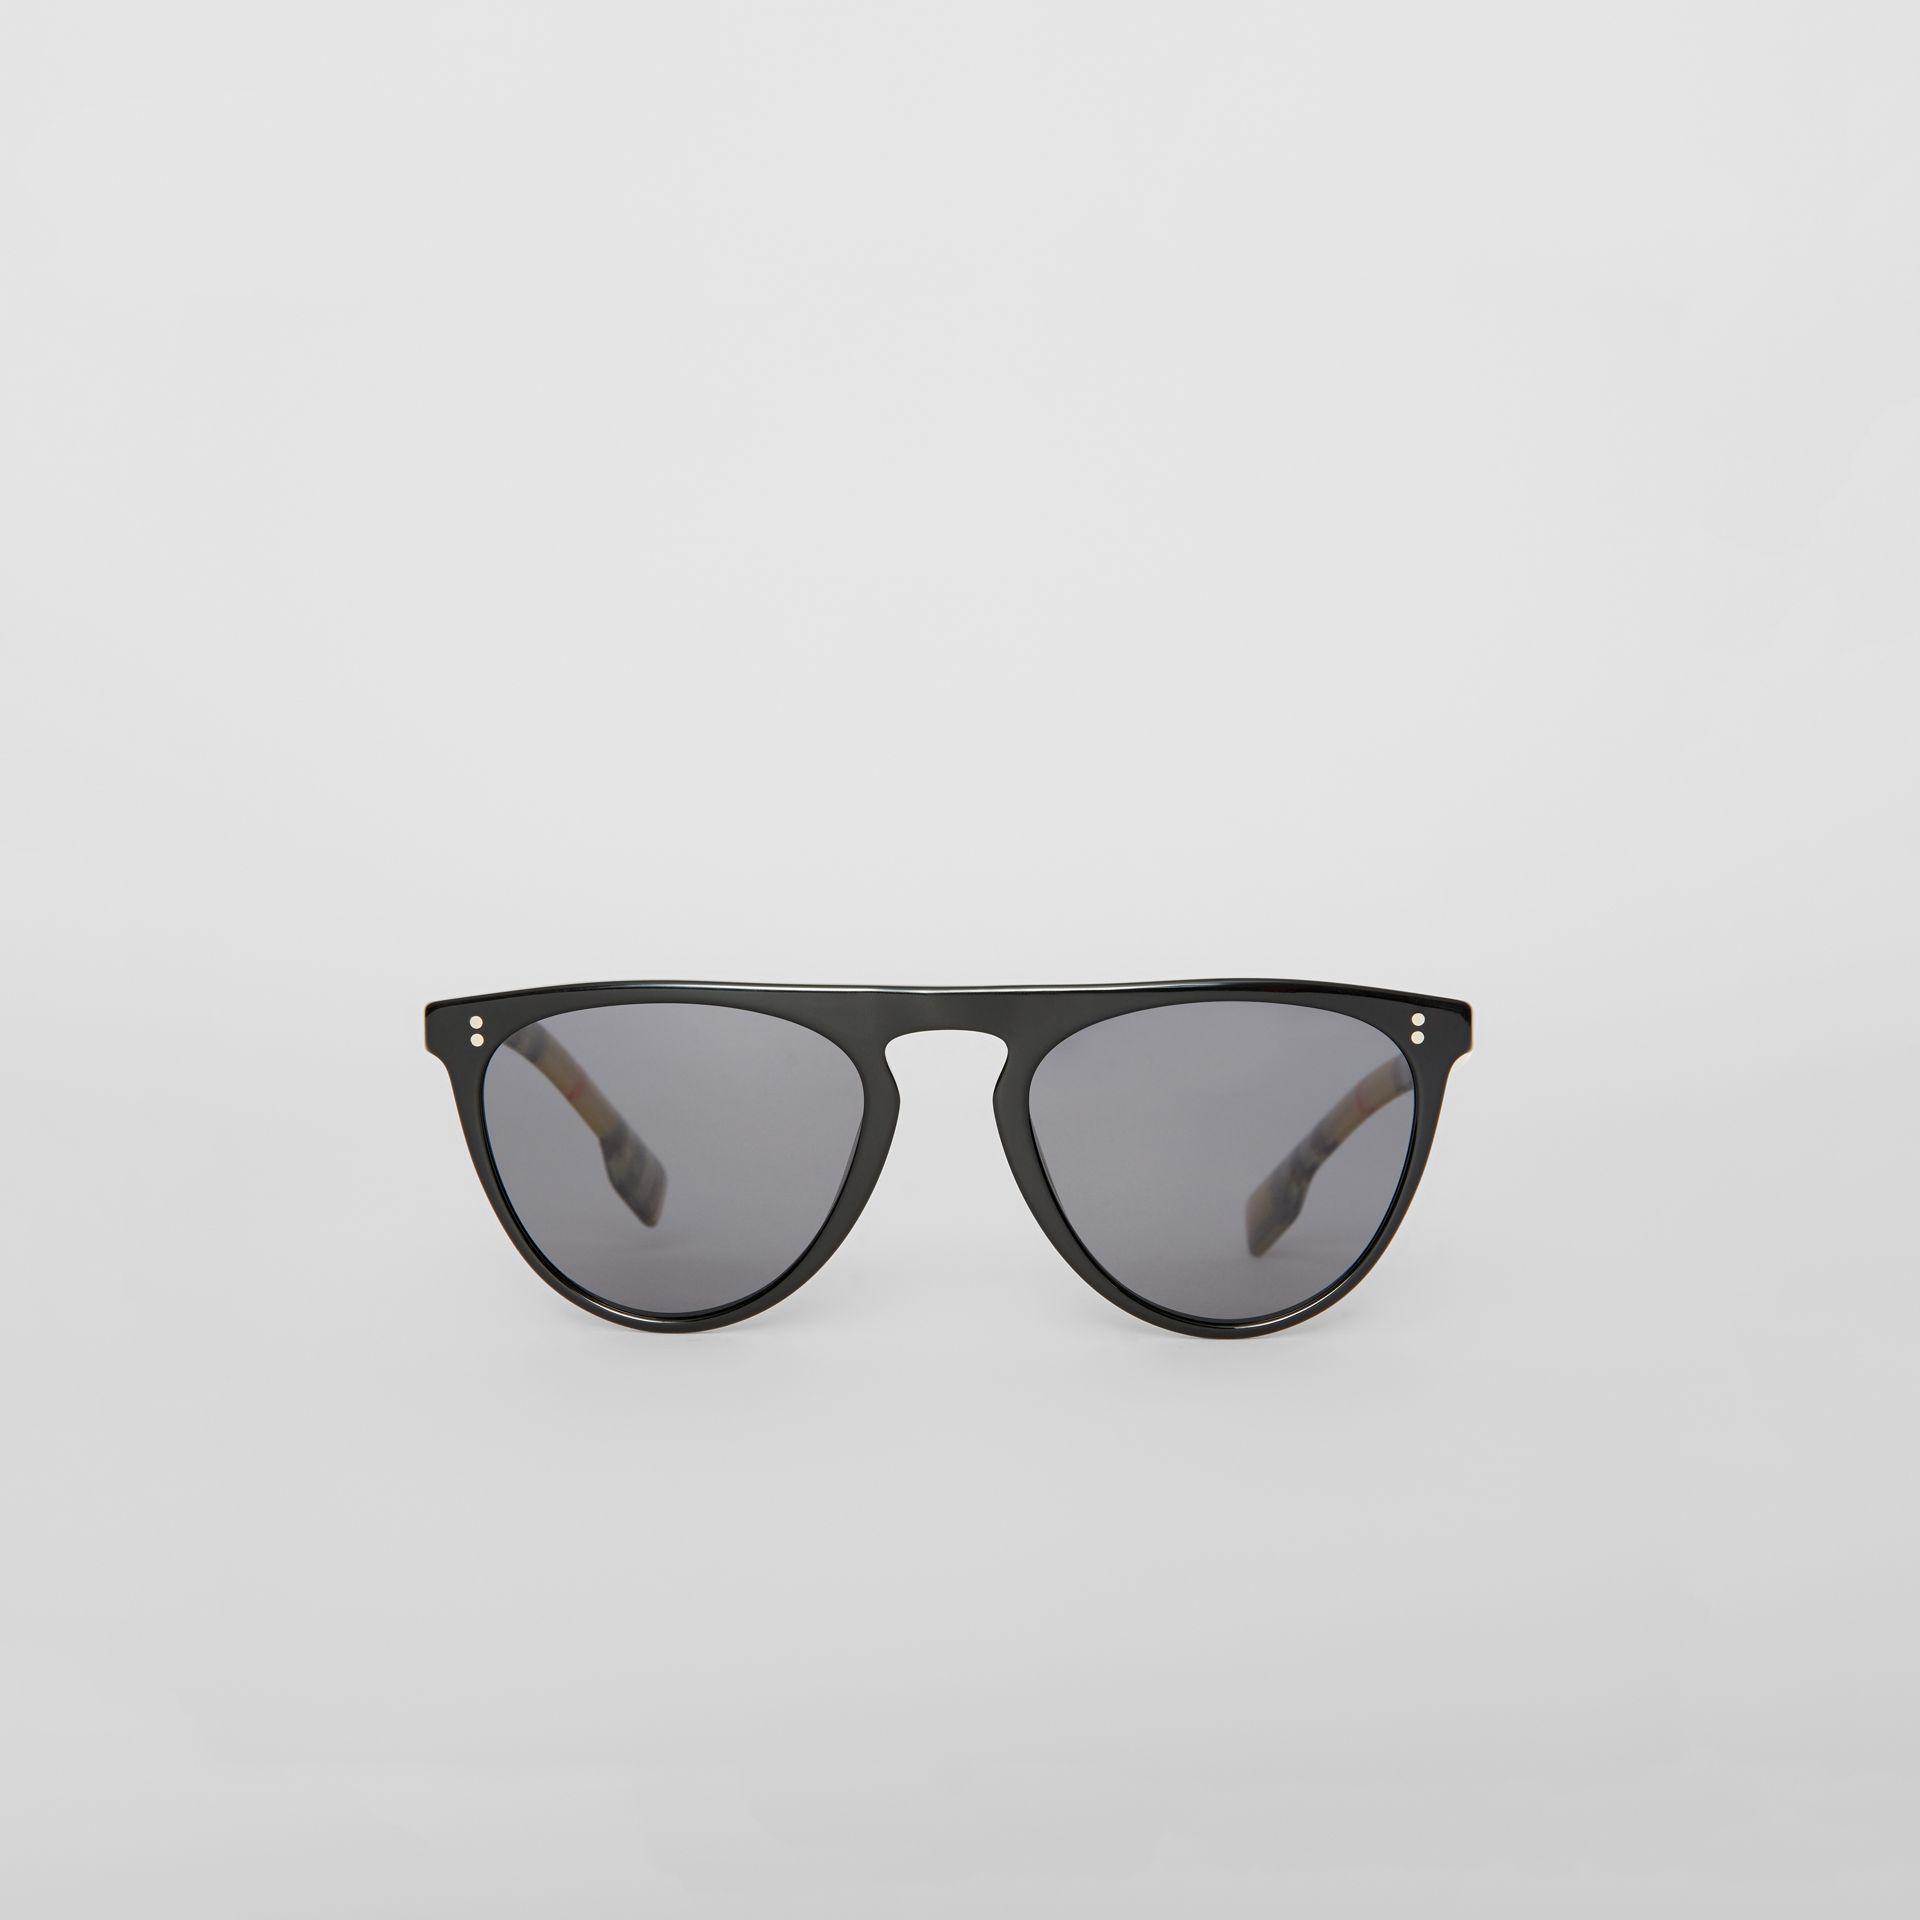 bc3d915c4dc1 Burberry Vintage Check Detail Keyhole D-shaped Sunglasses in Black ...